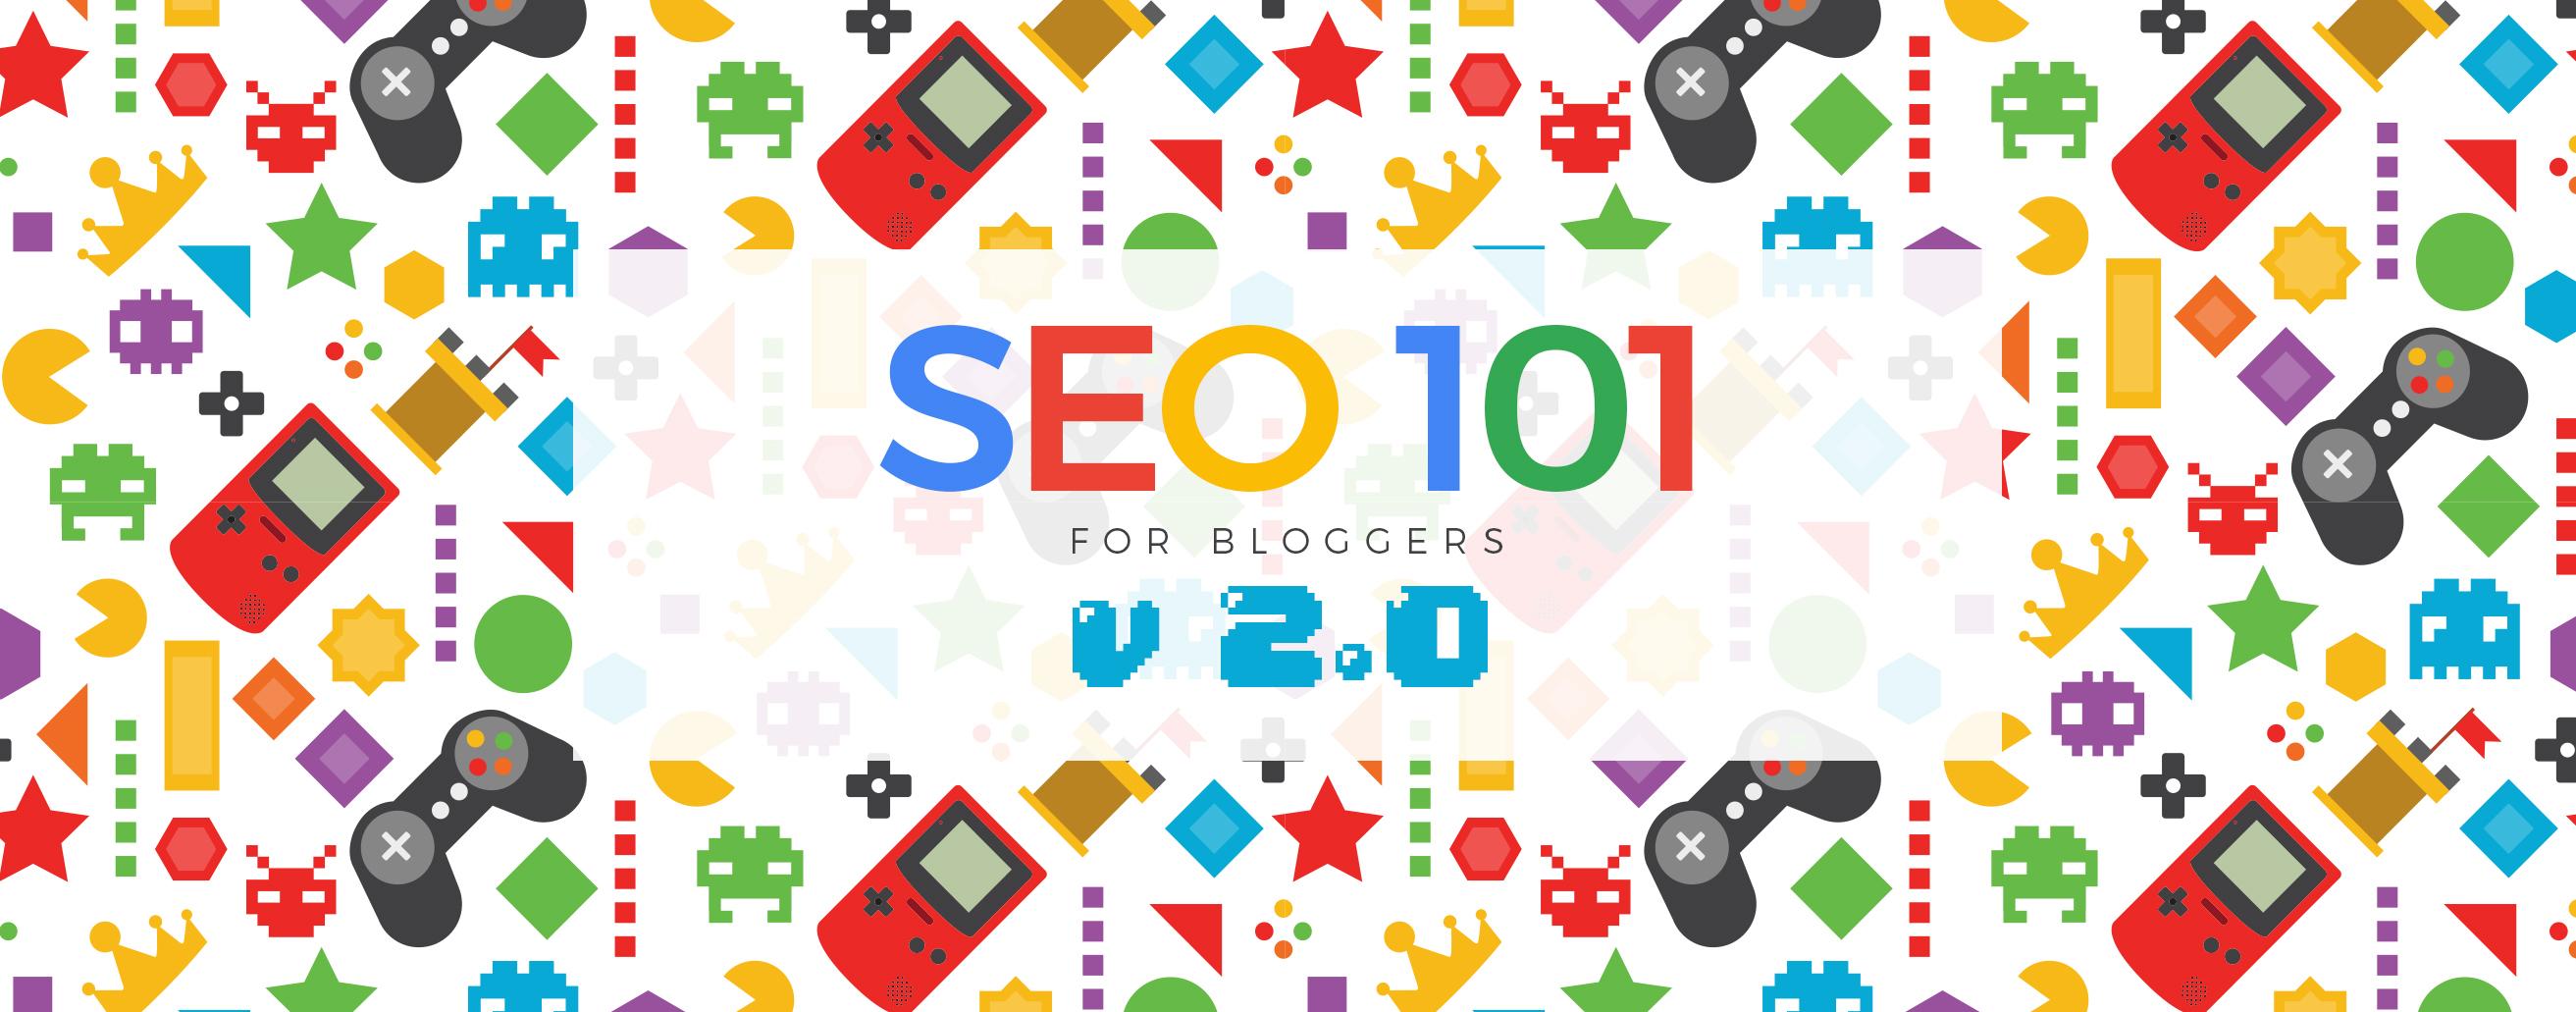 seo 101 for bloggers v2p0